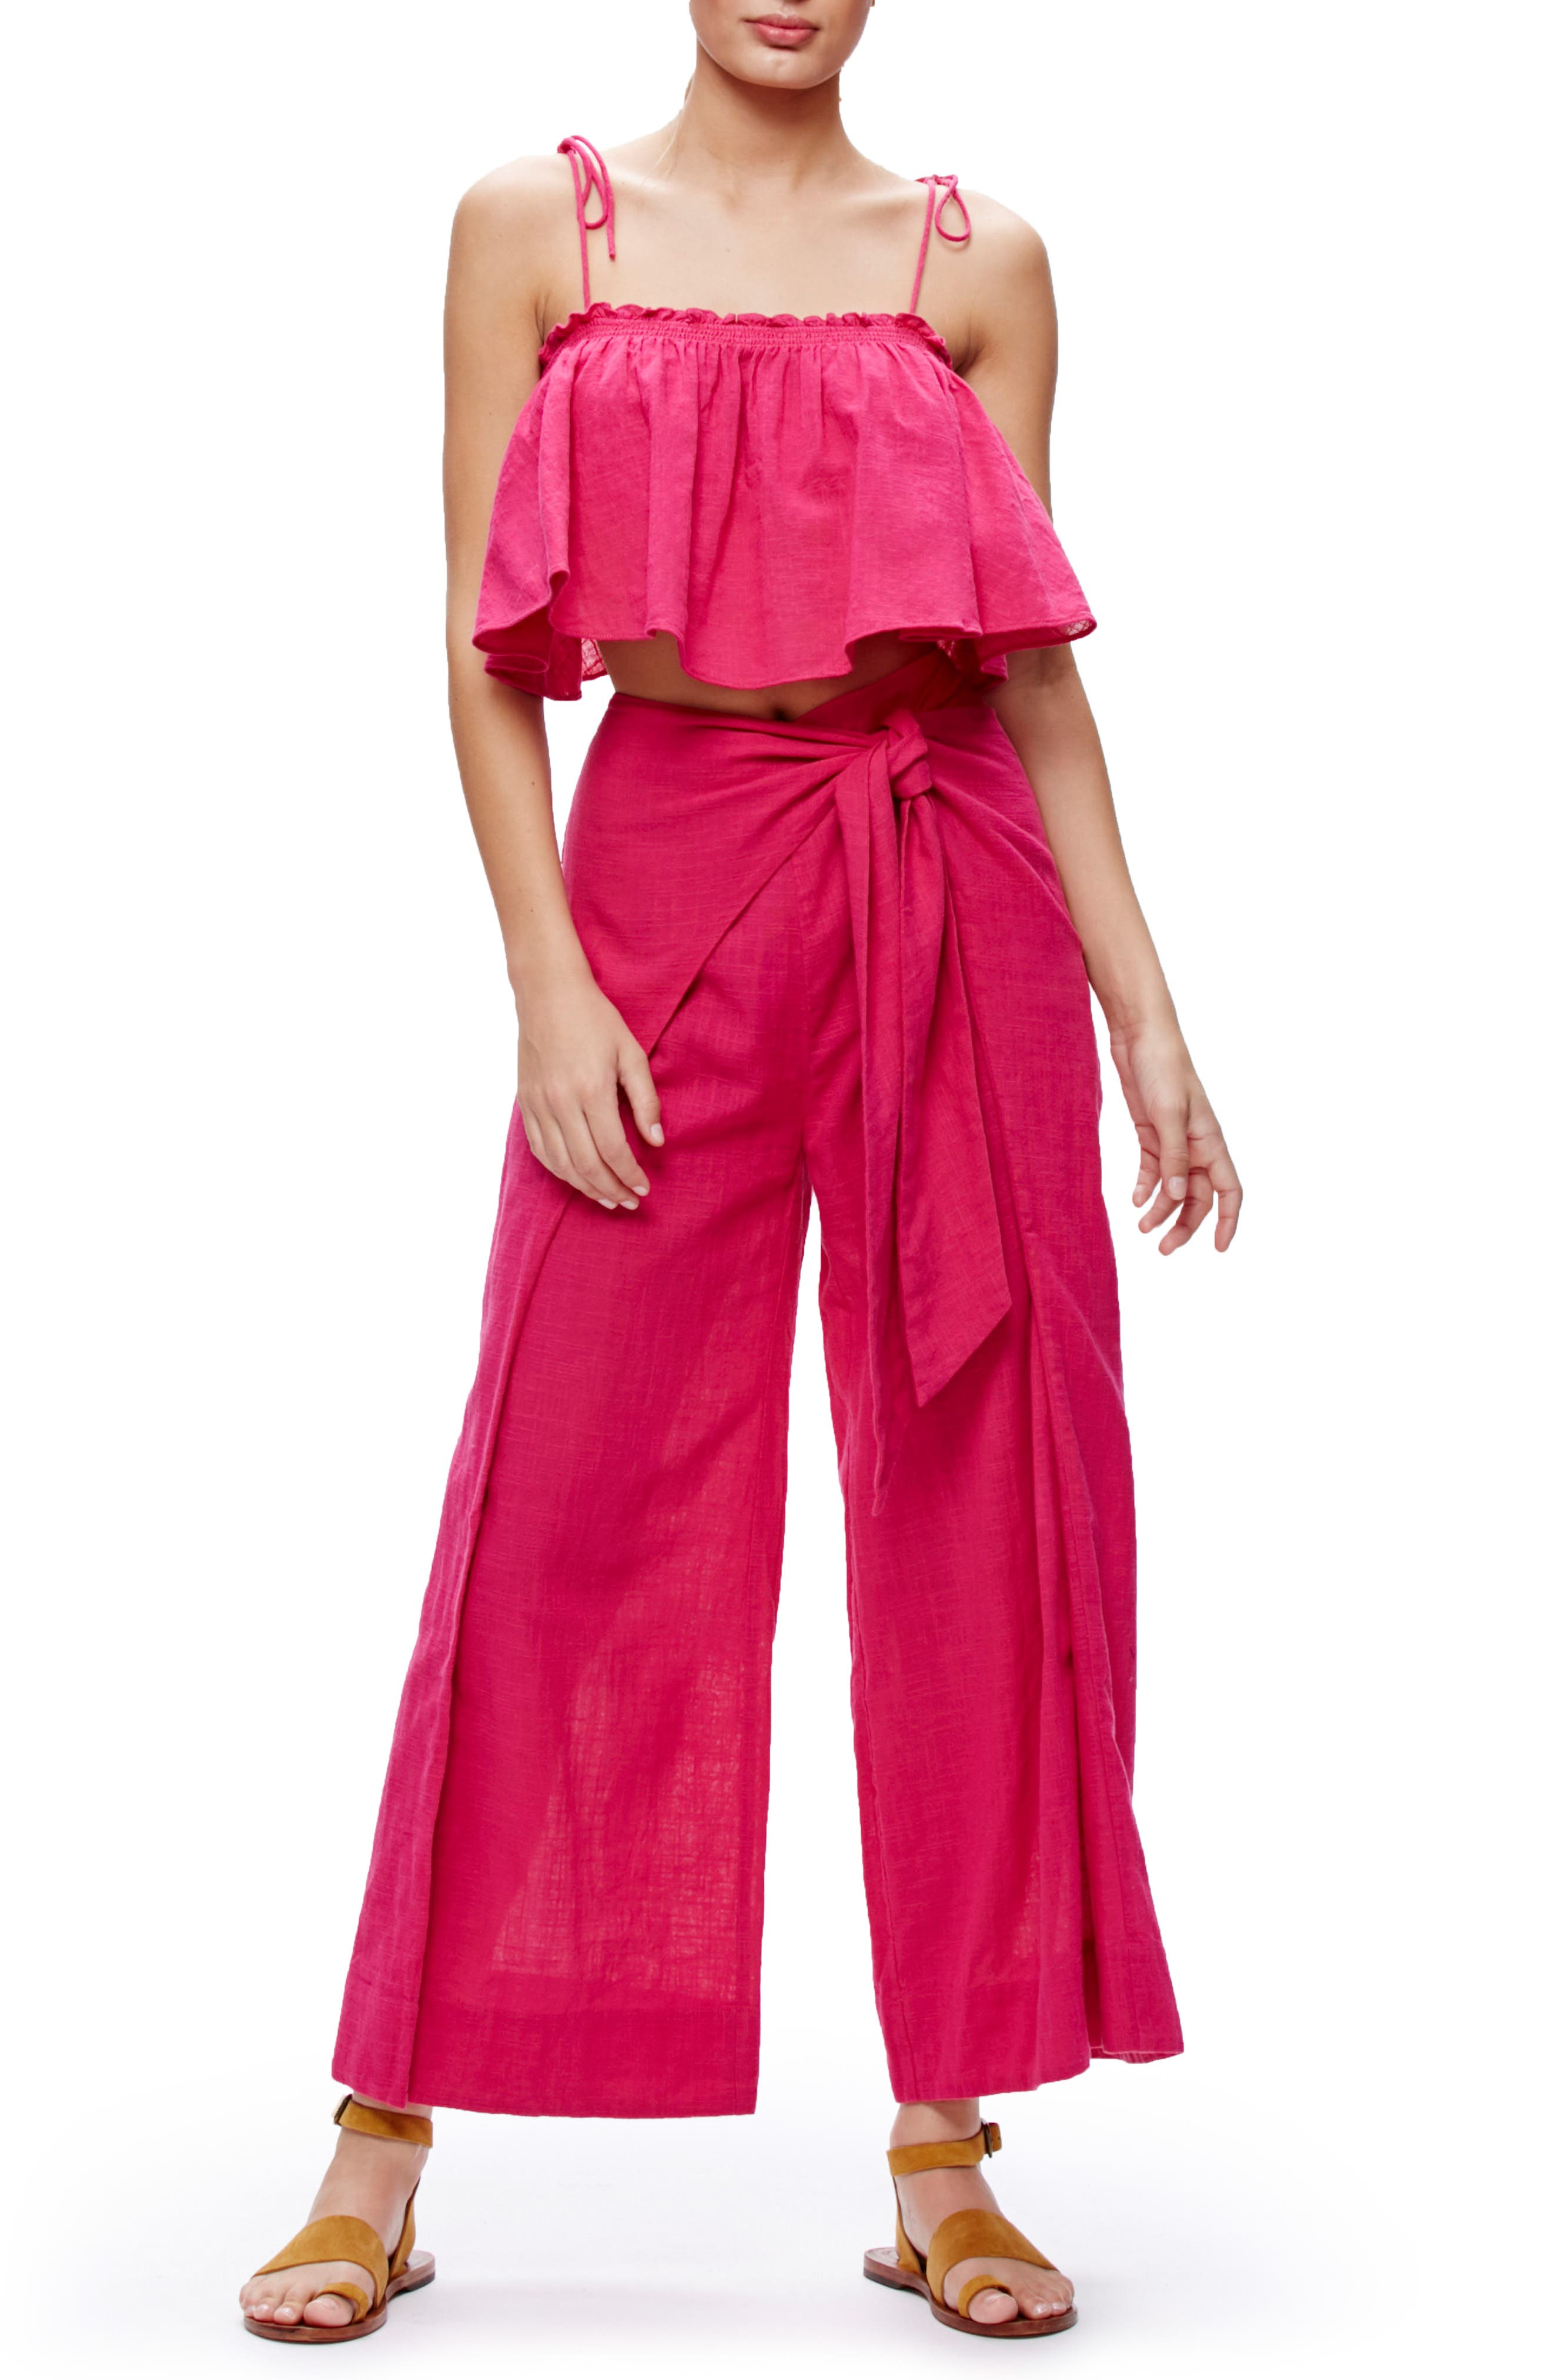 Tropic Babe Crop Top & High Waist Pants Set,                         Main,                         color, Dark Pink